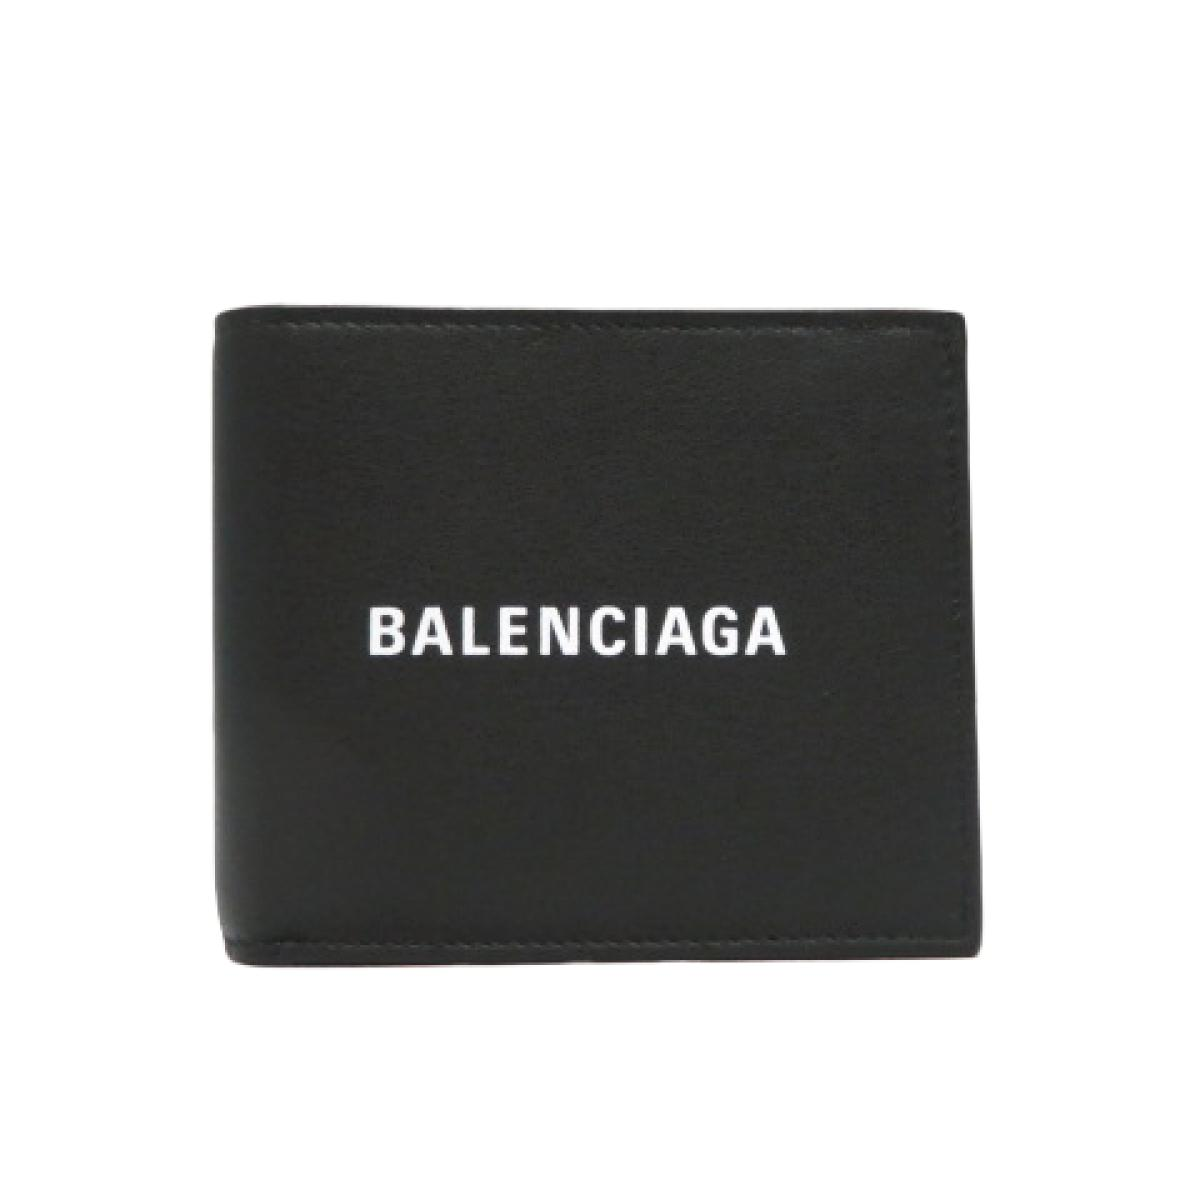 BALENCIAGA(バレンシアガ)/二つ折札入れ 財布 メンズ レディース/財布/黒系/ブラック系/牛革(カーフ)/【ランクS】(485108)【中古】